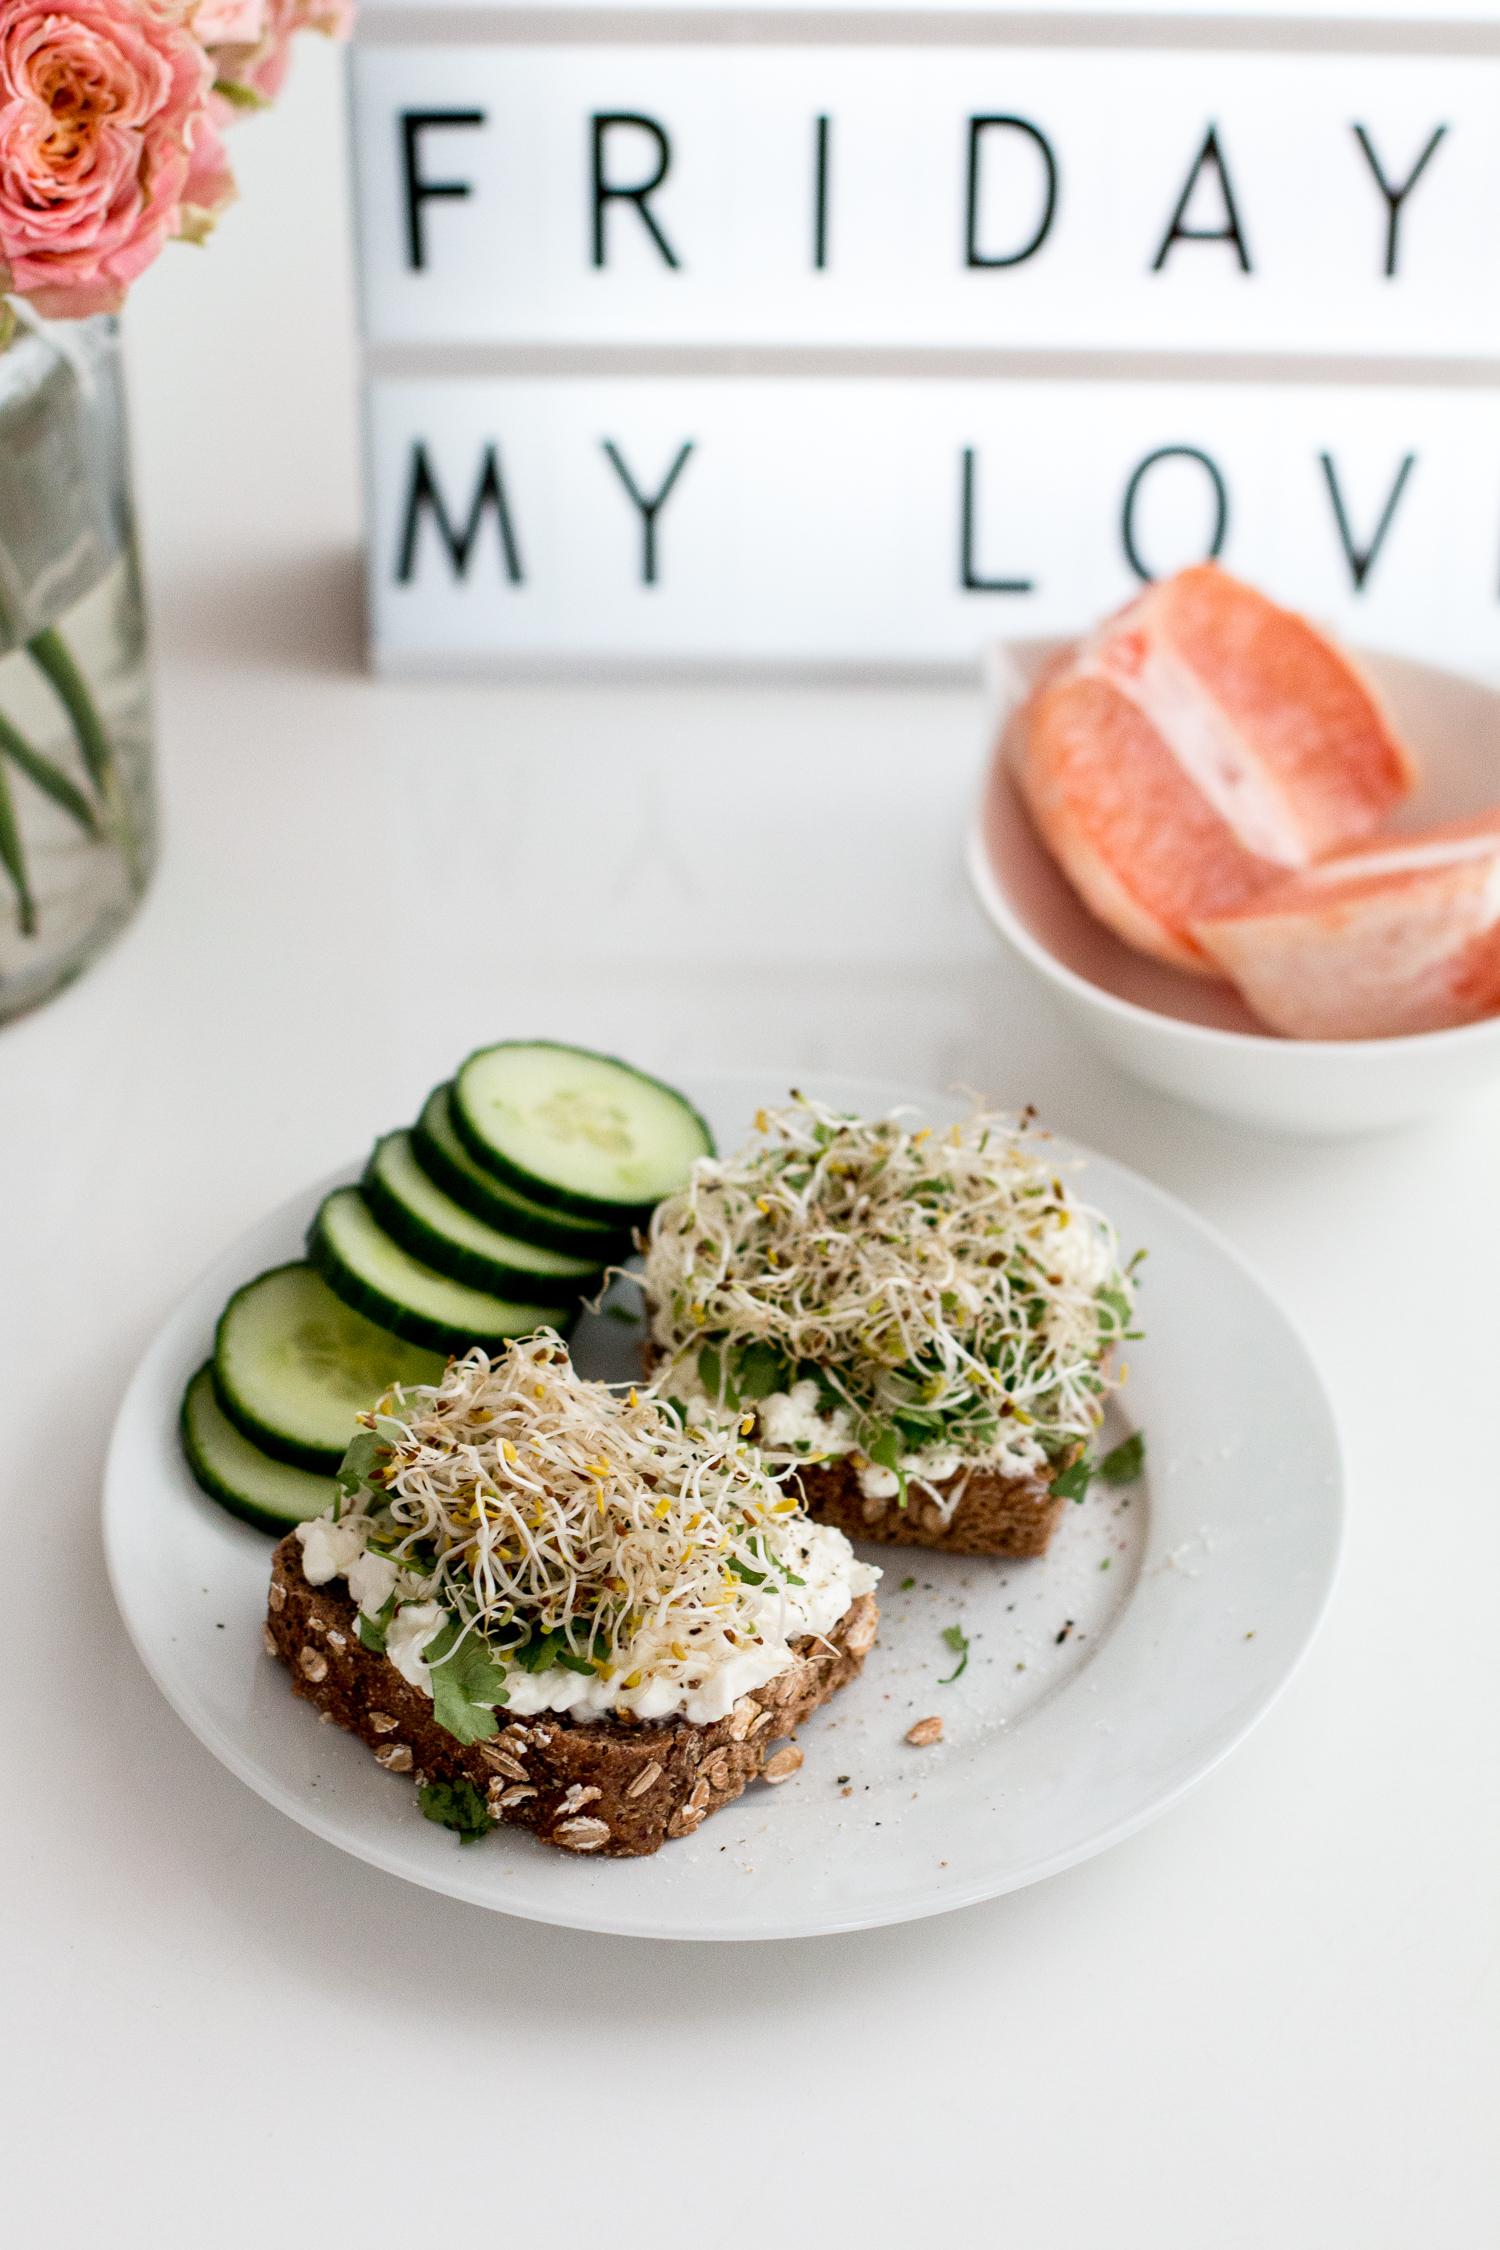 7 days, 7 meals: breakfast diary